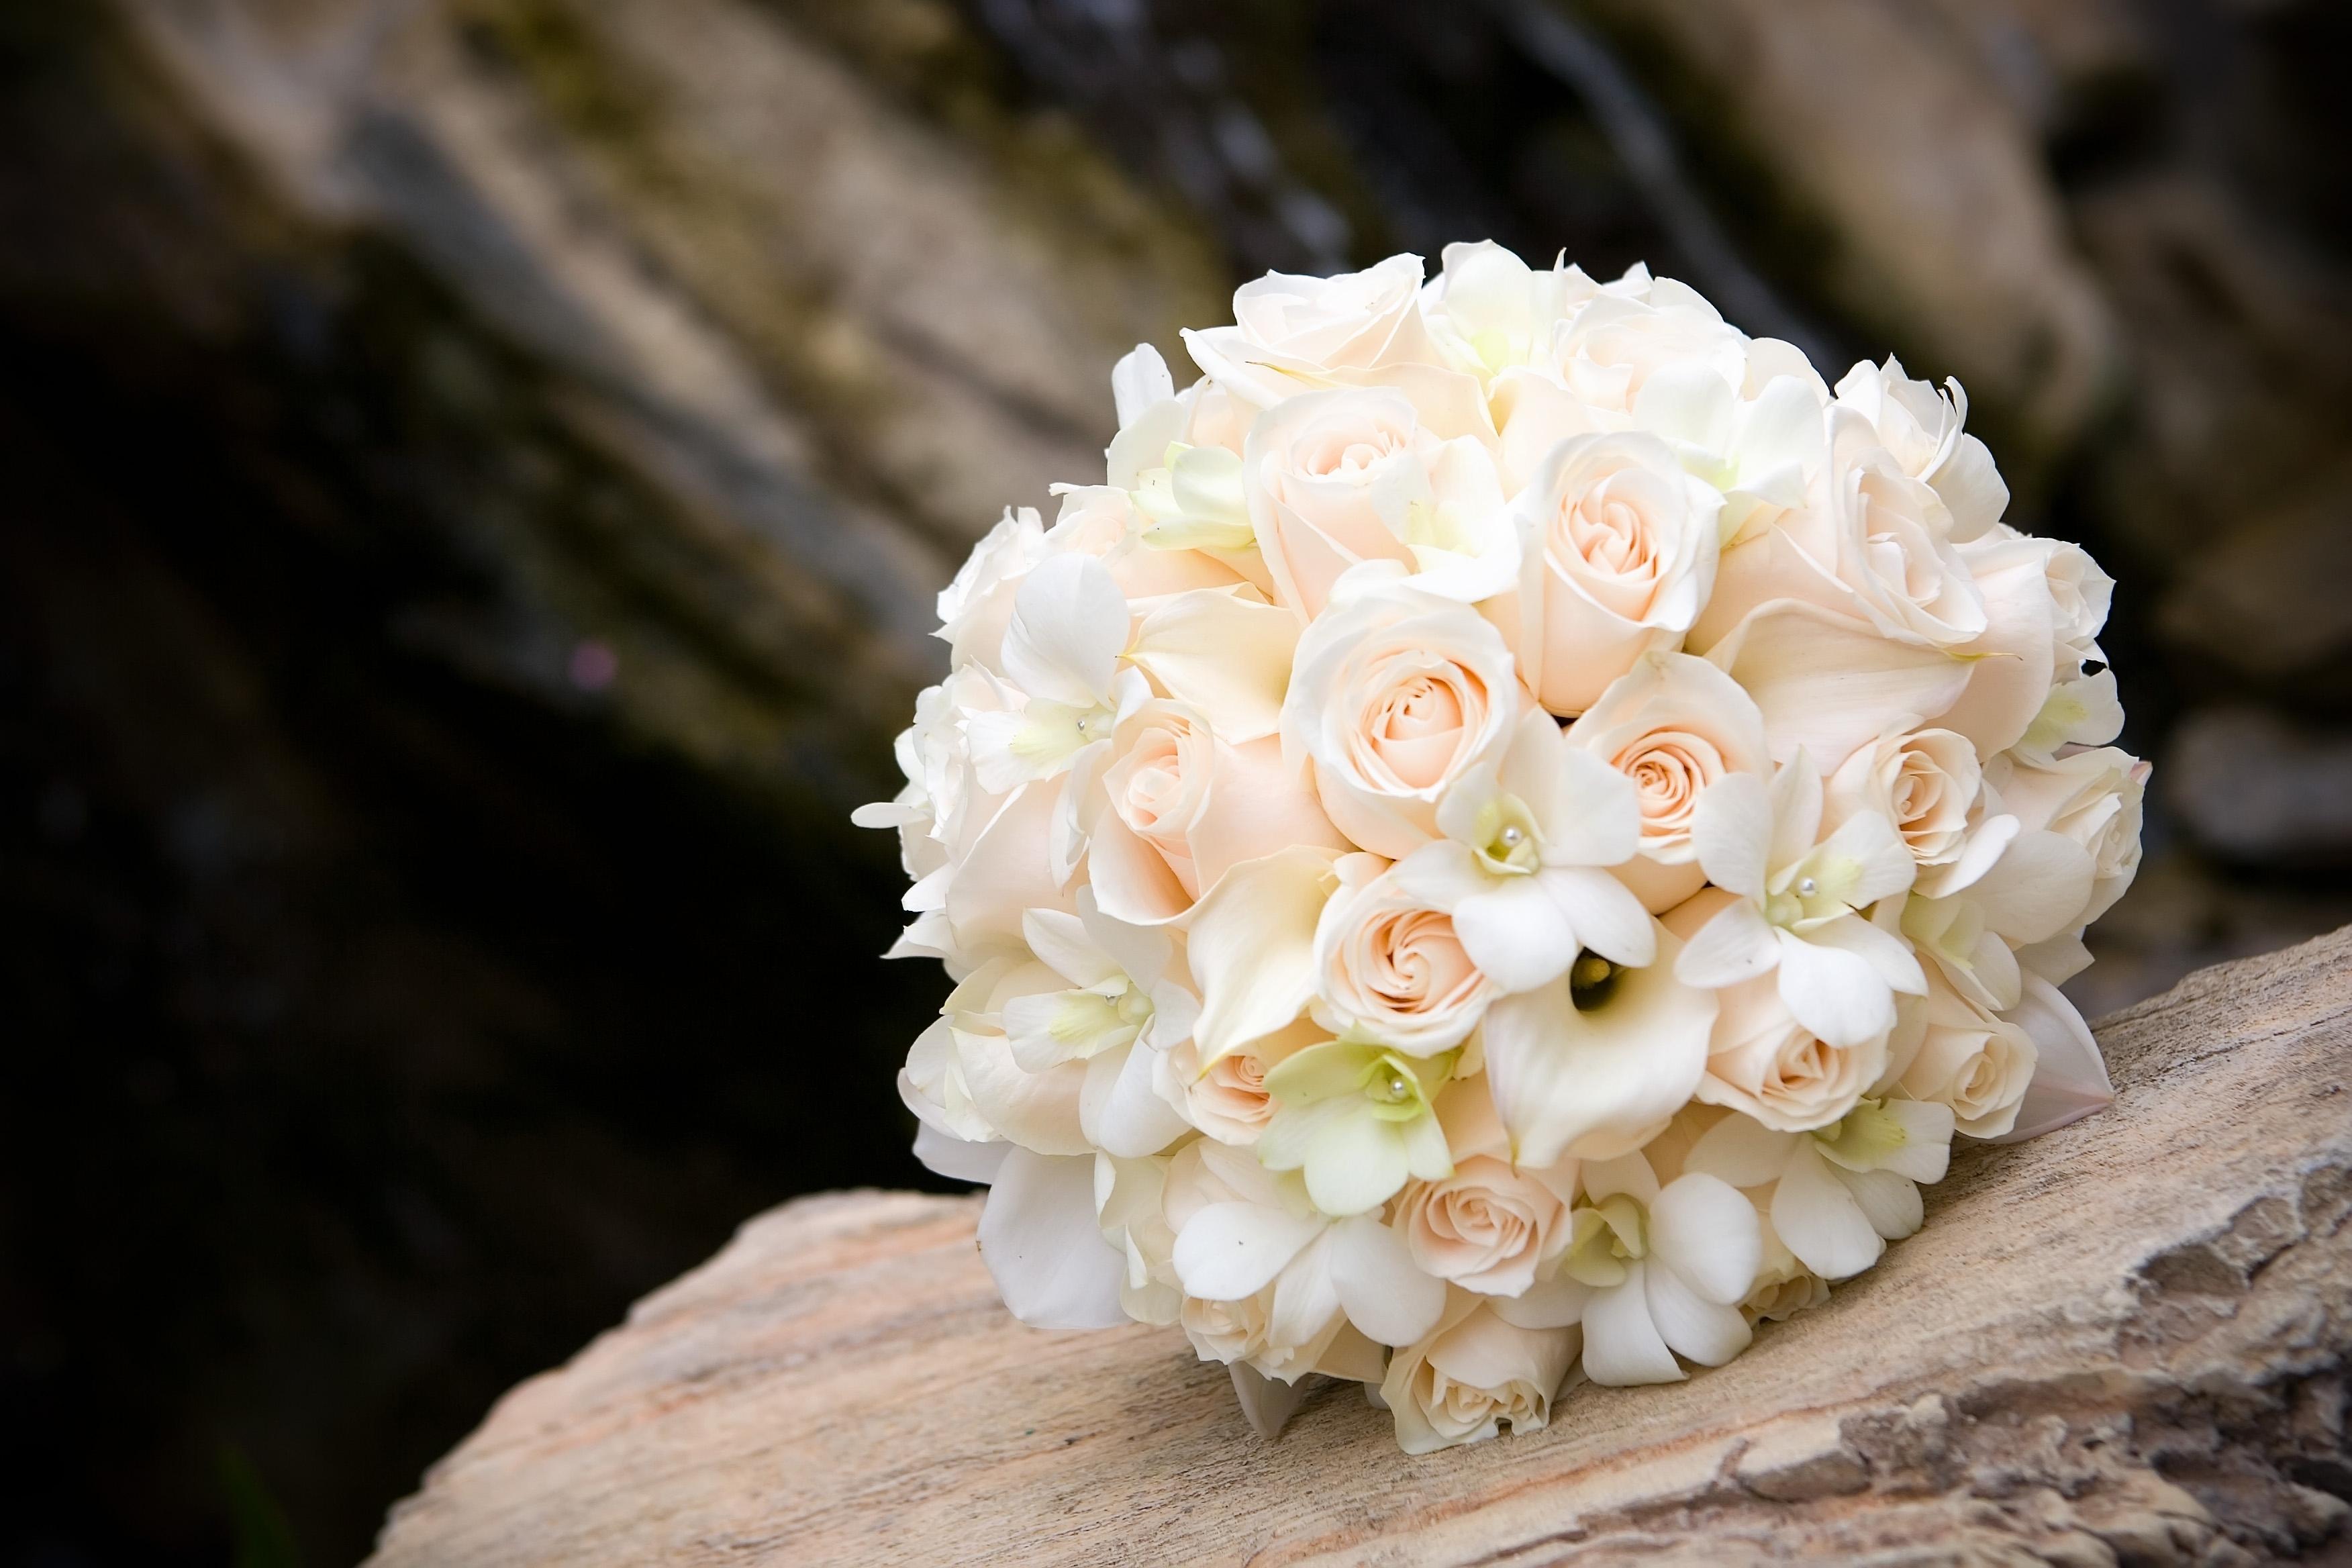 Flowers & Decor, Flowers, Lola